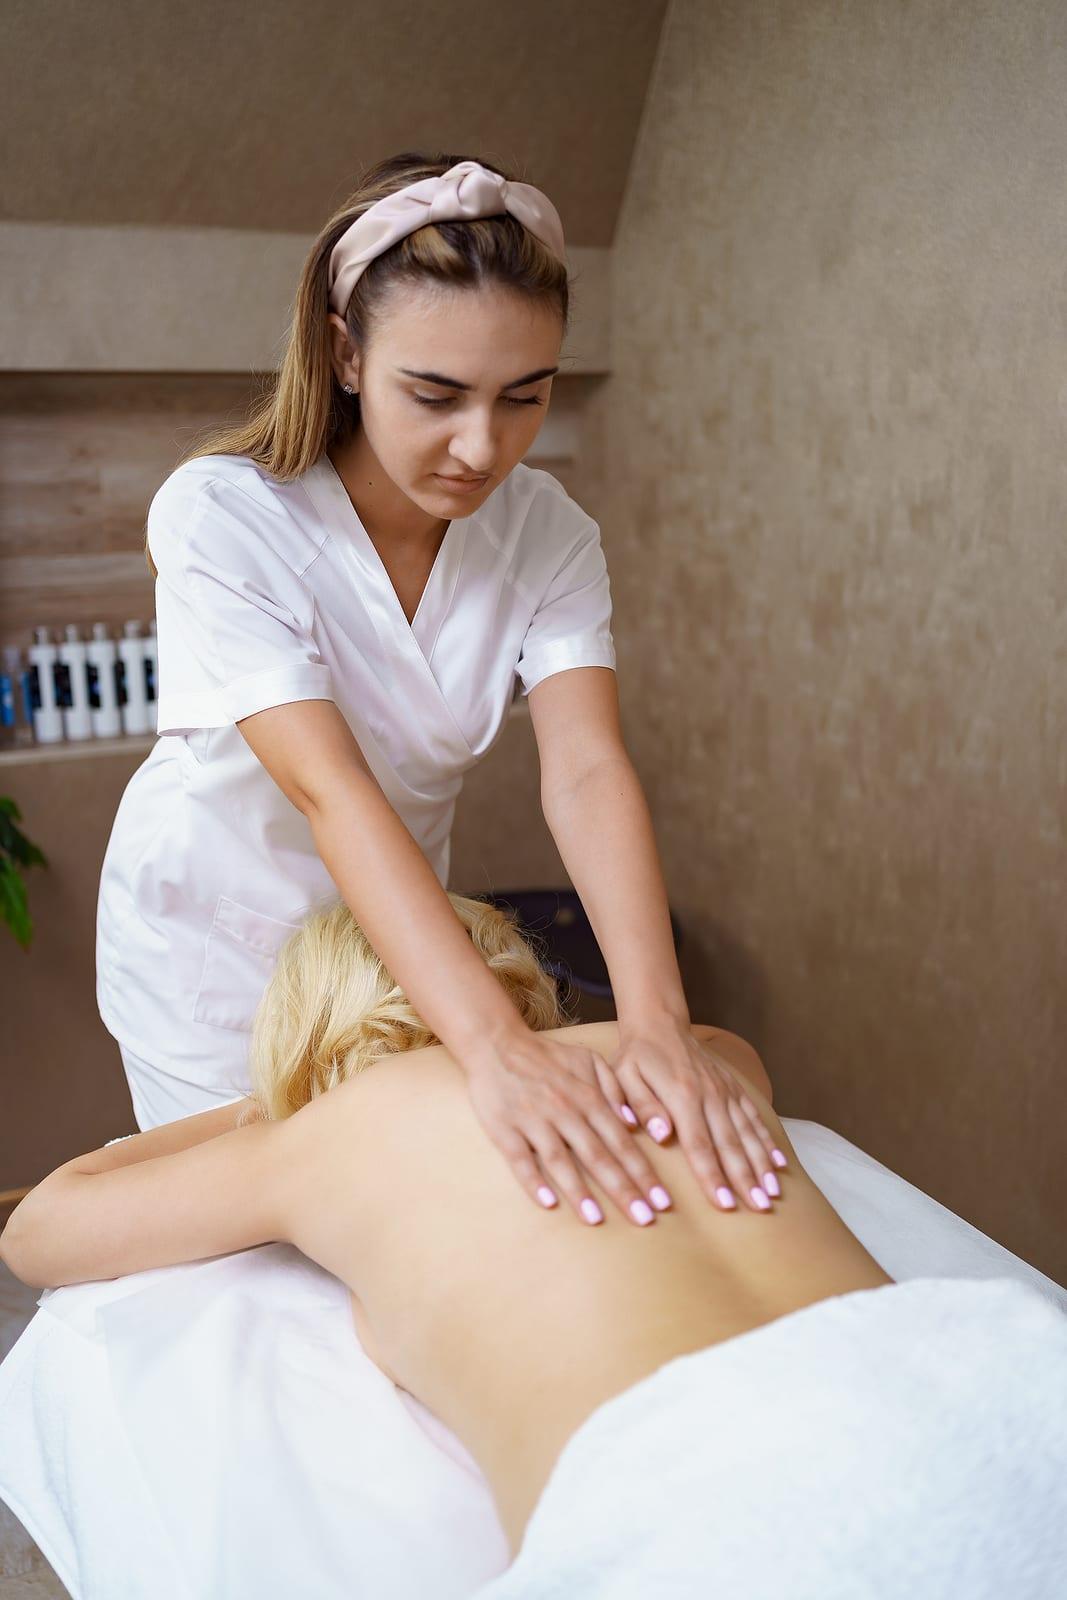 Massage Therapy Schools In Phoenix Az Trade Schools Near You